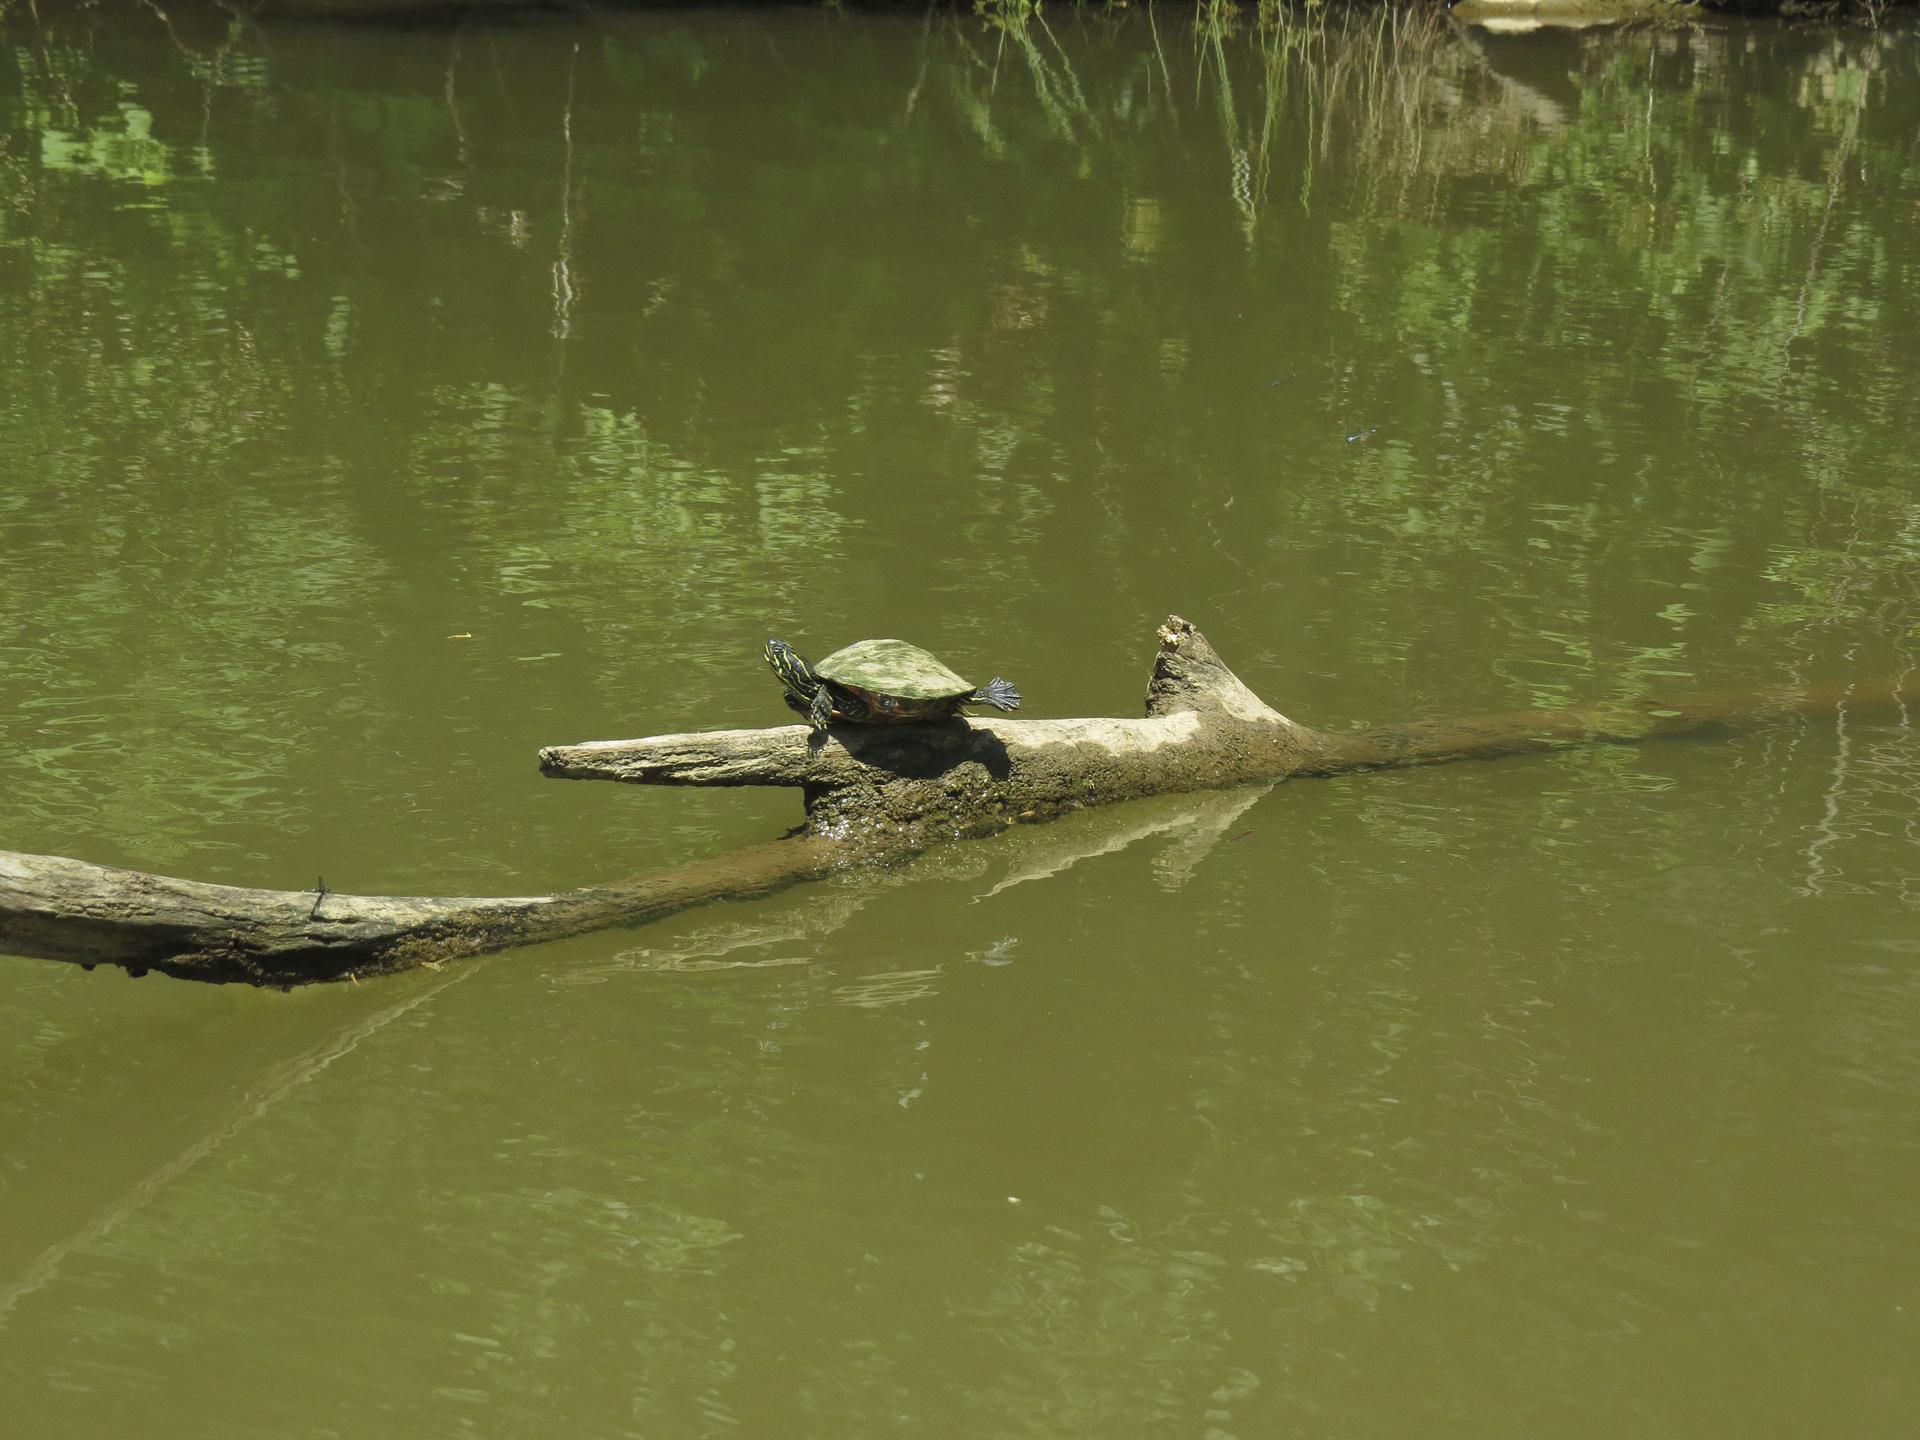 turtle-maryland-water-nature-outdoors-kayaking